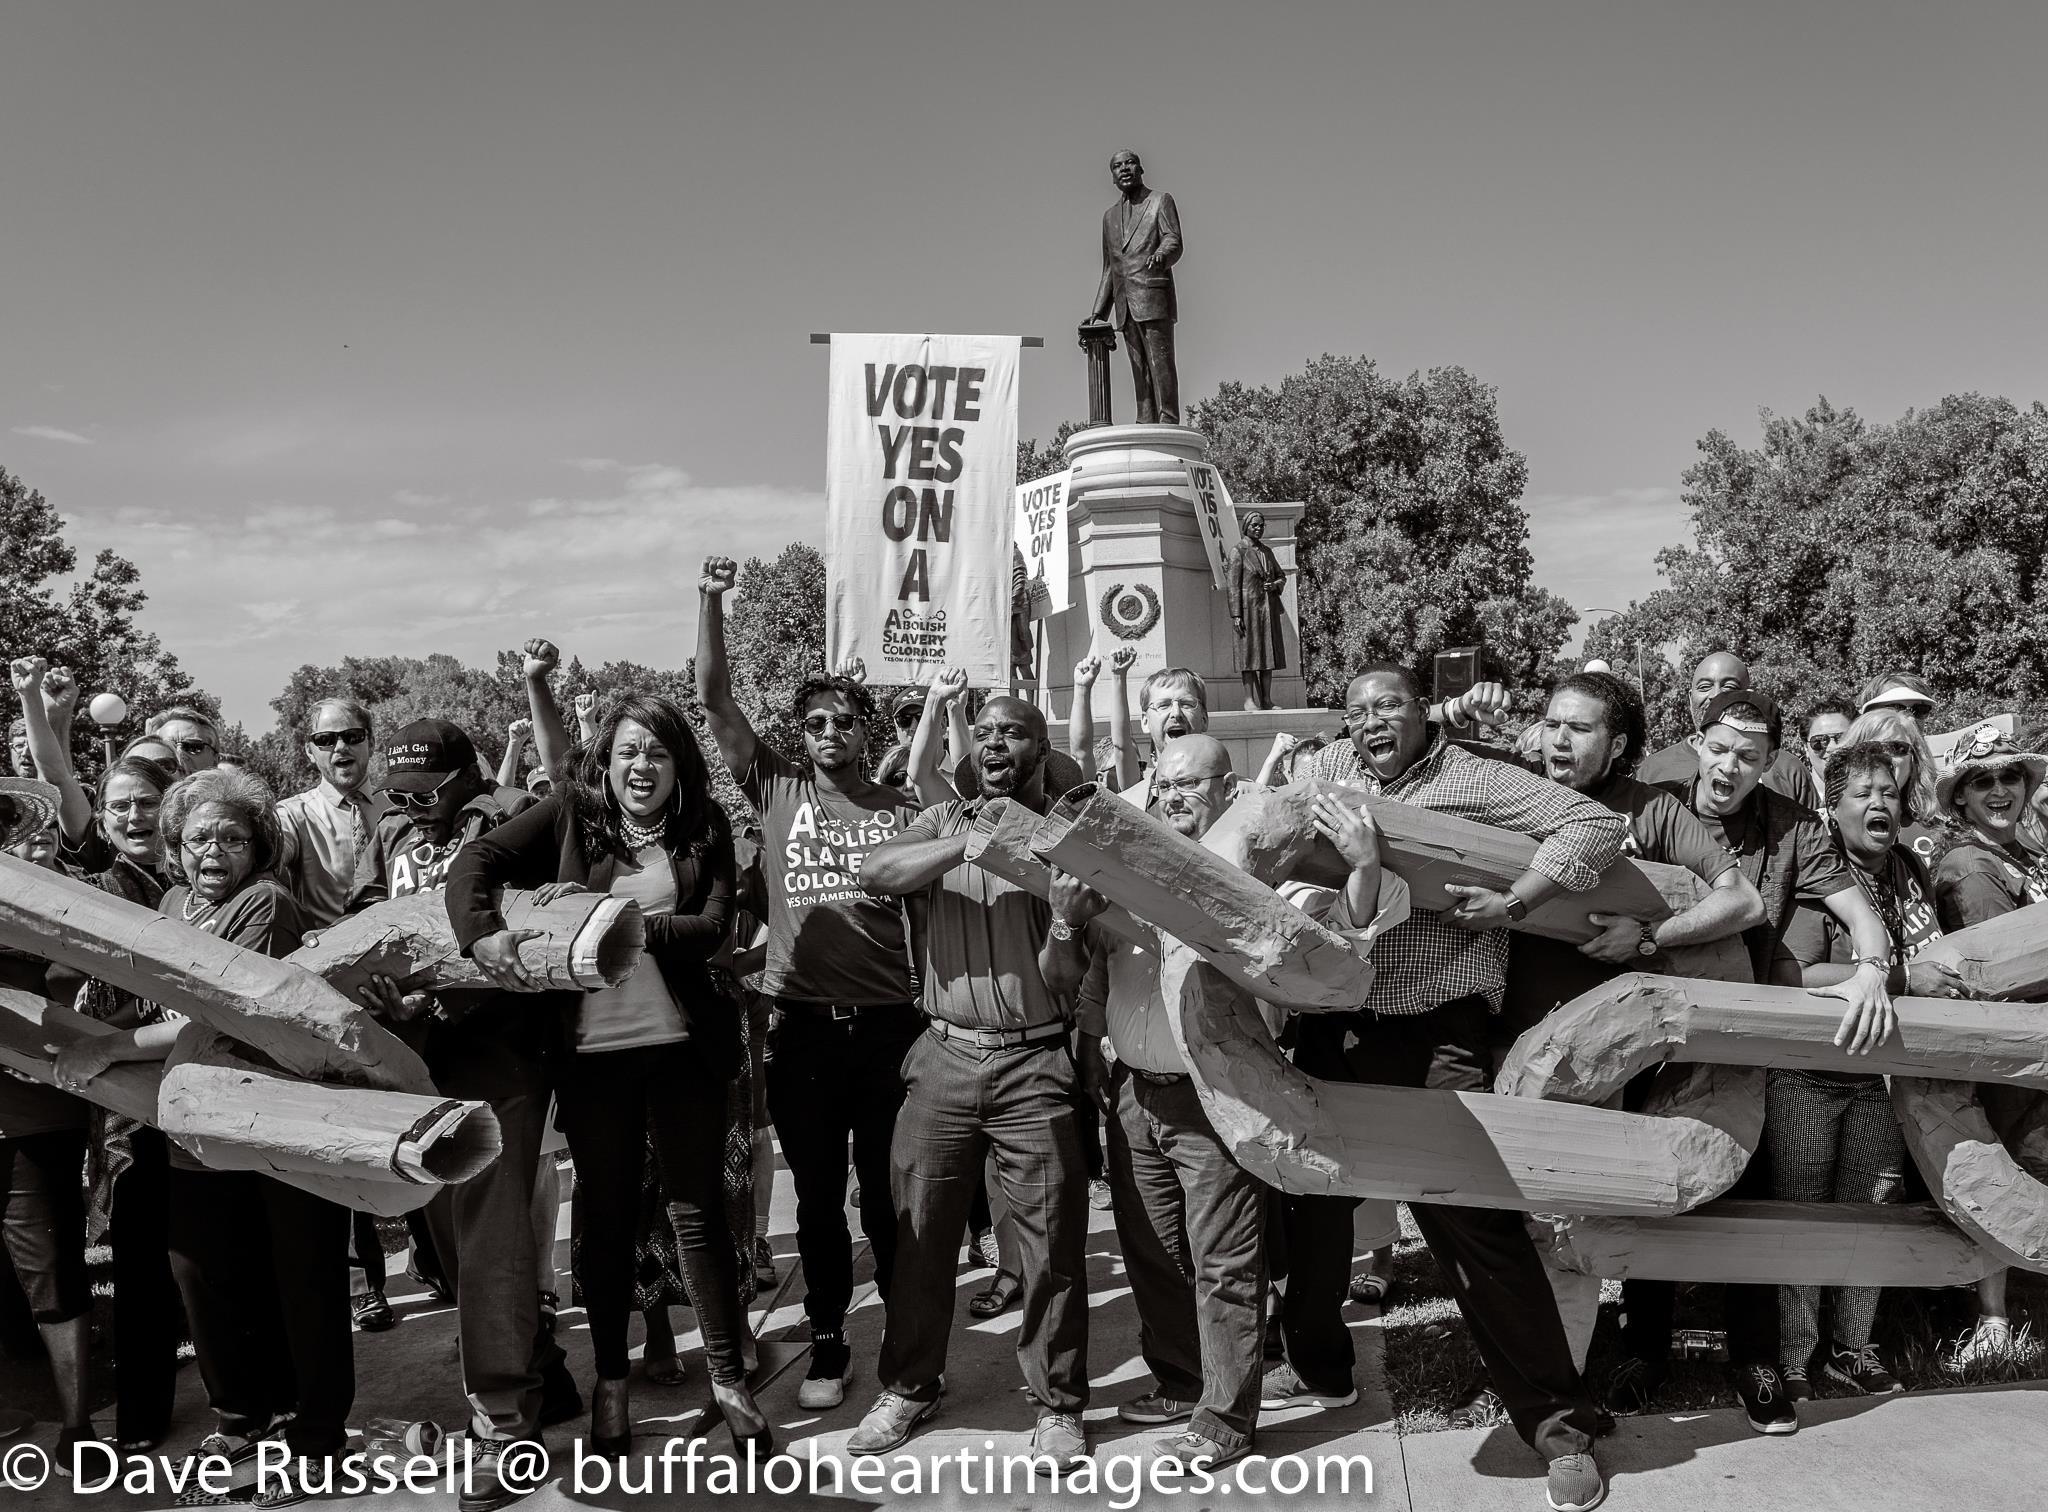 Dave Russell_BuffaloHeartImages_Abolish Slavery Rally_082818.jpg